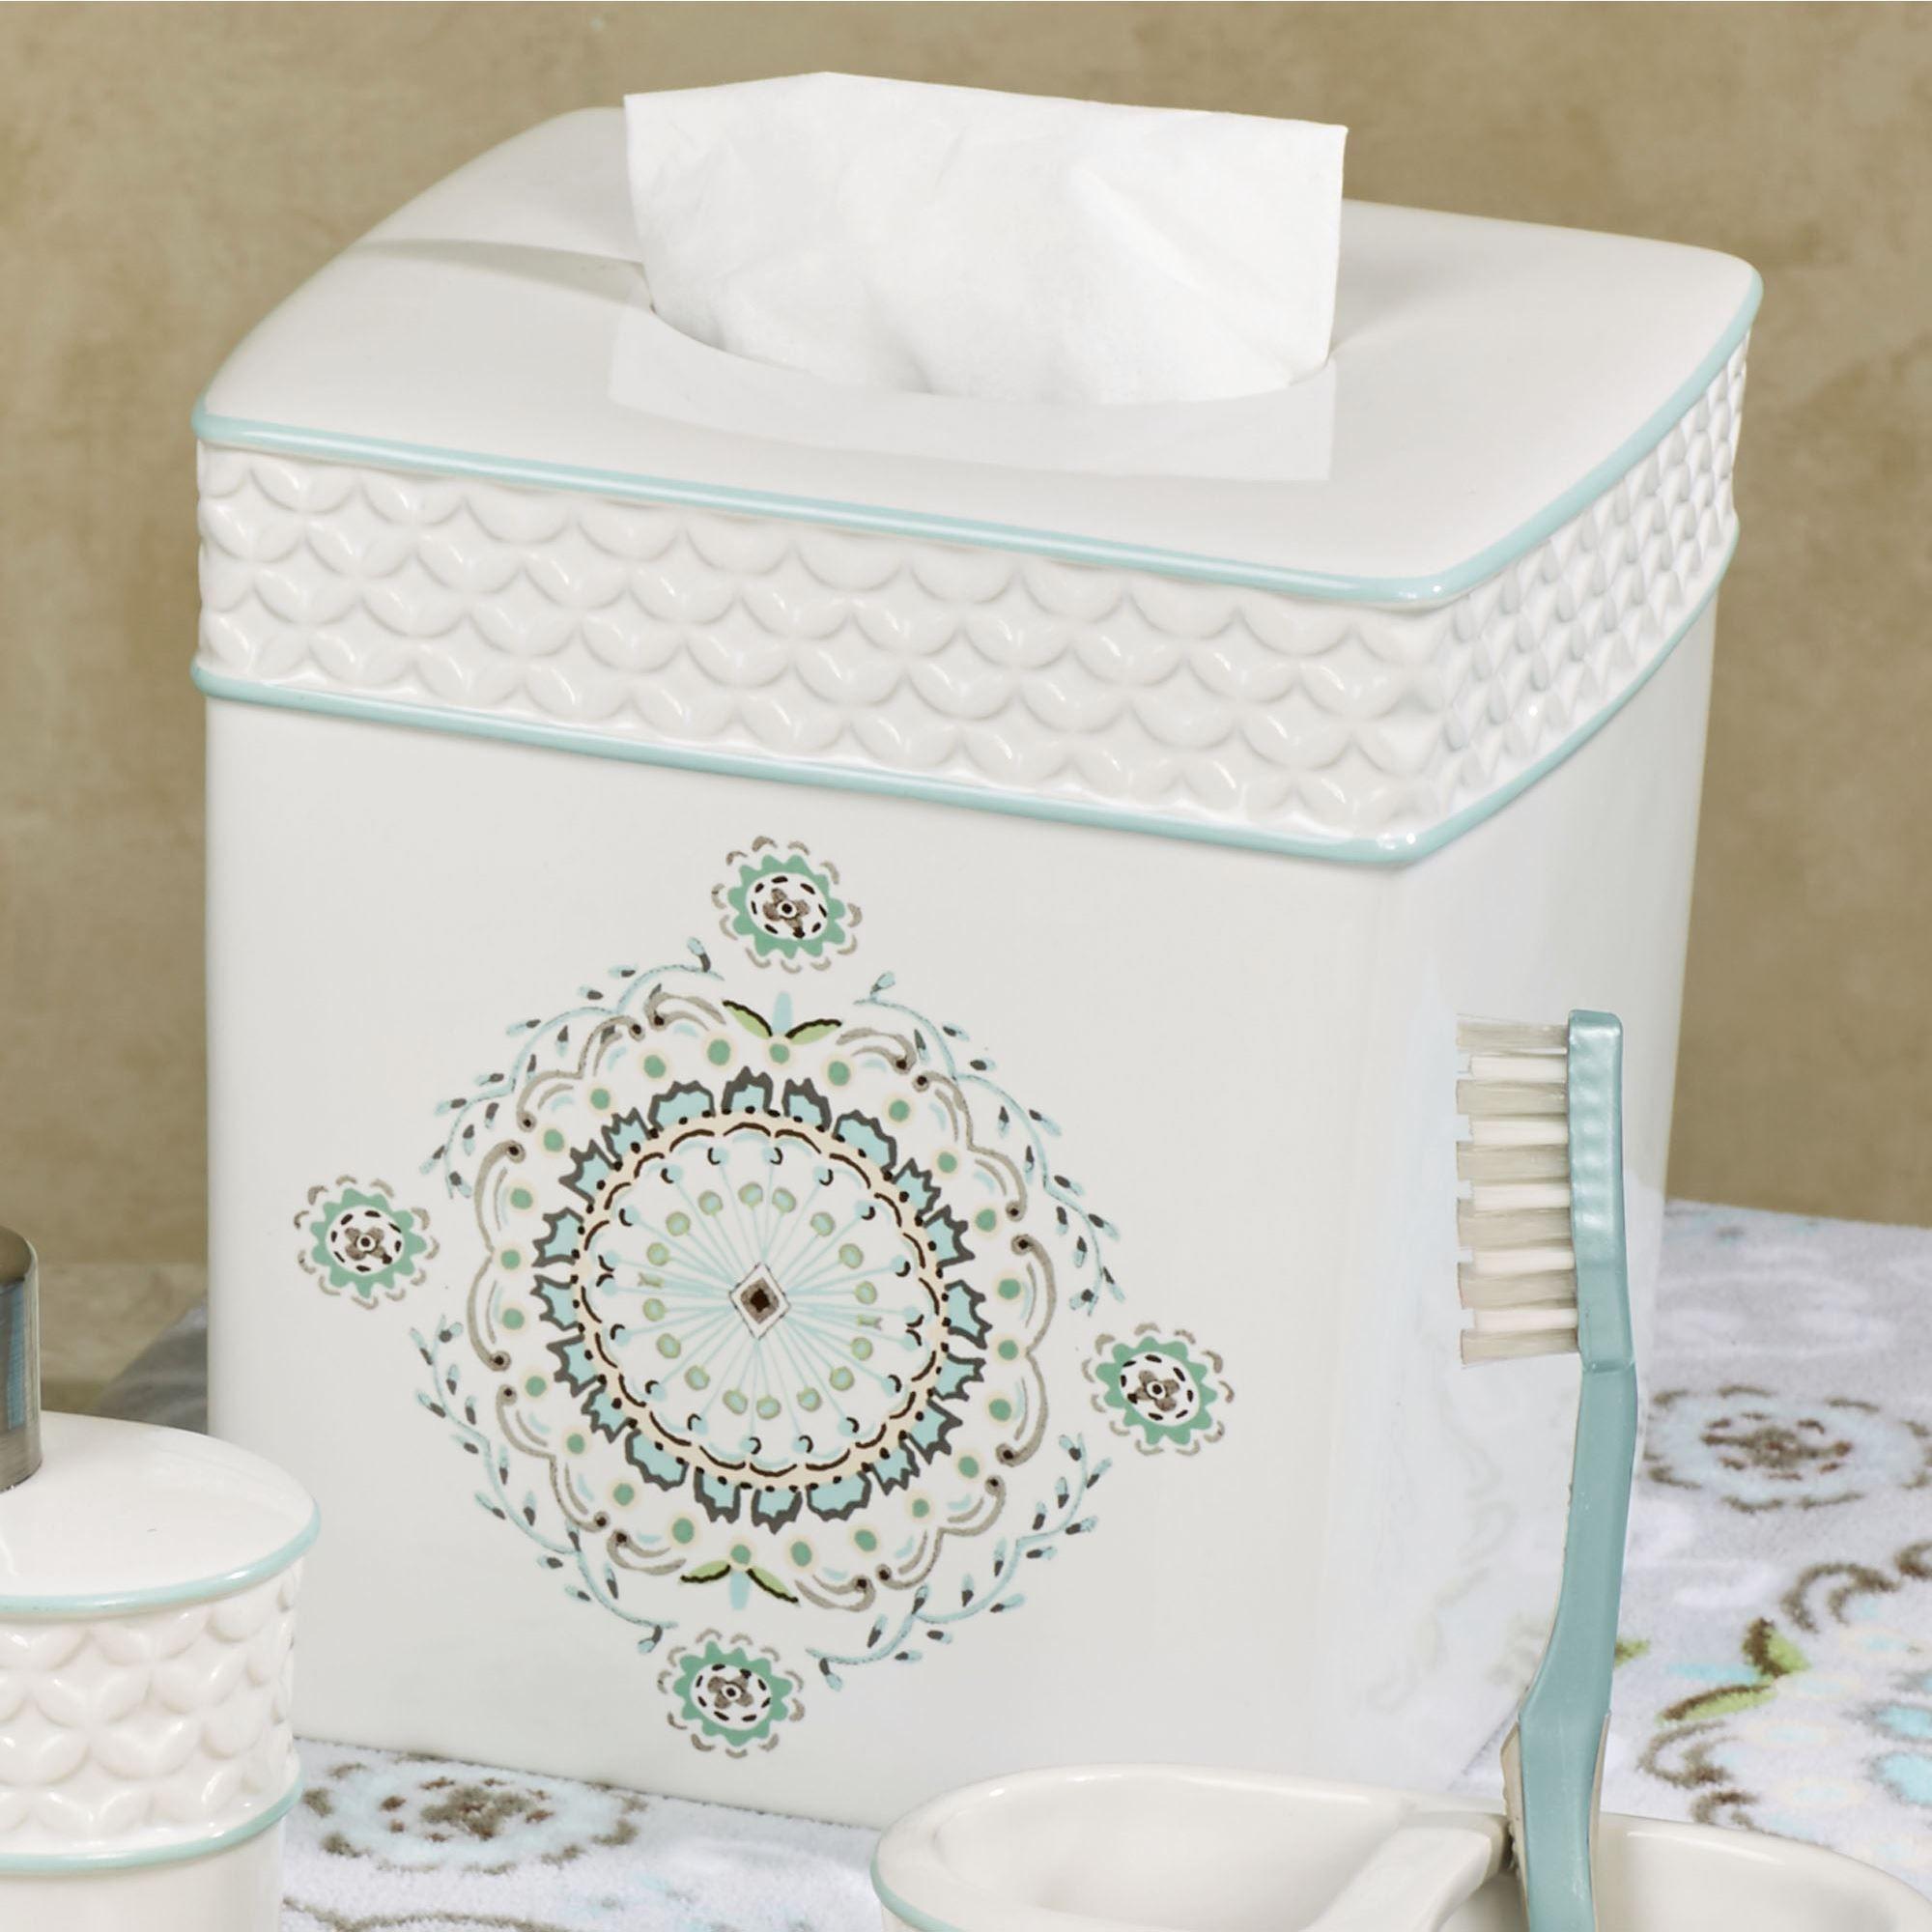 Camden Off White Ceramic Bath Accessories by Dena Home